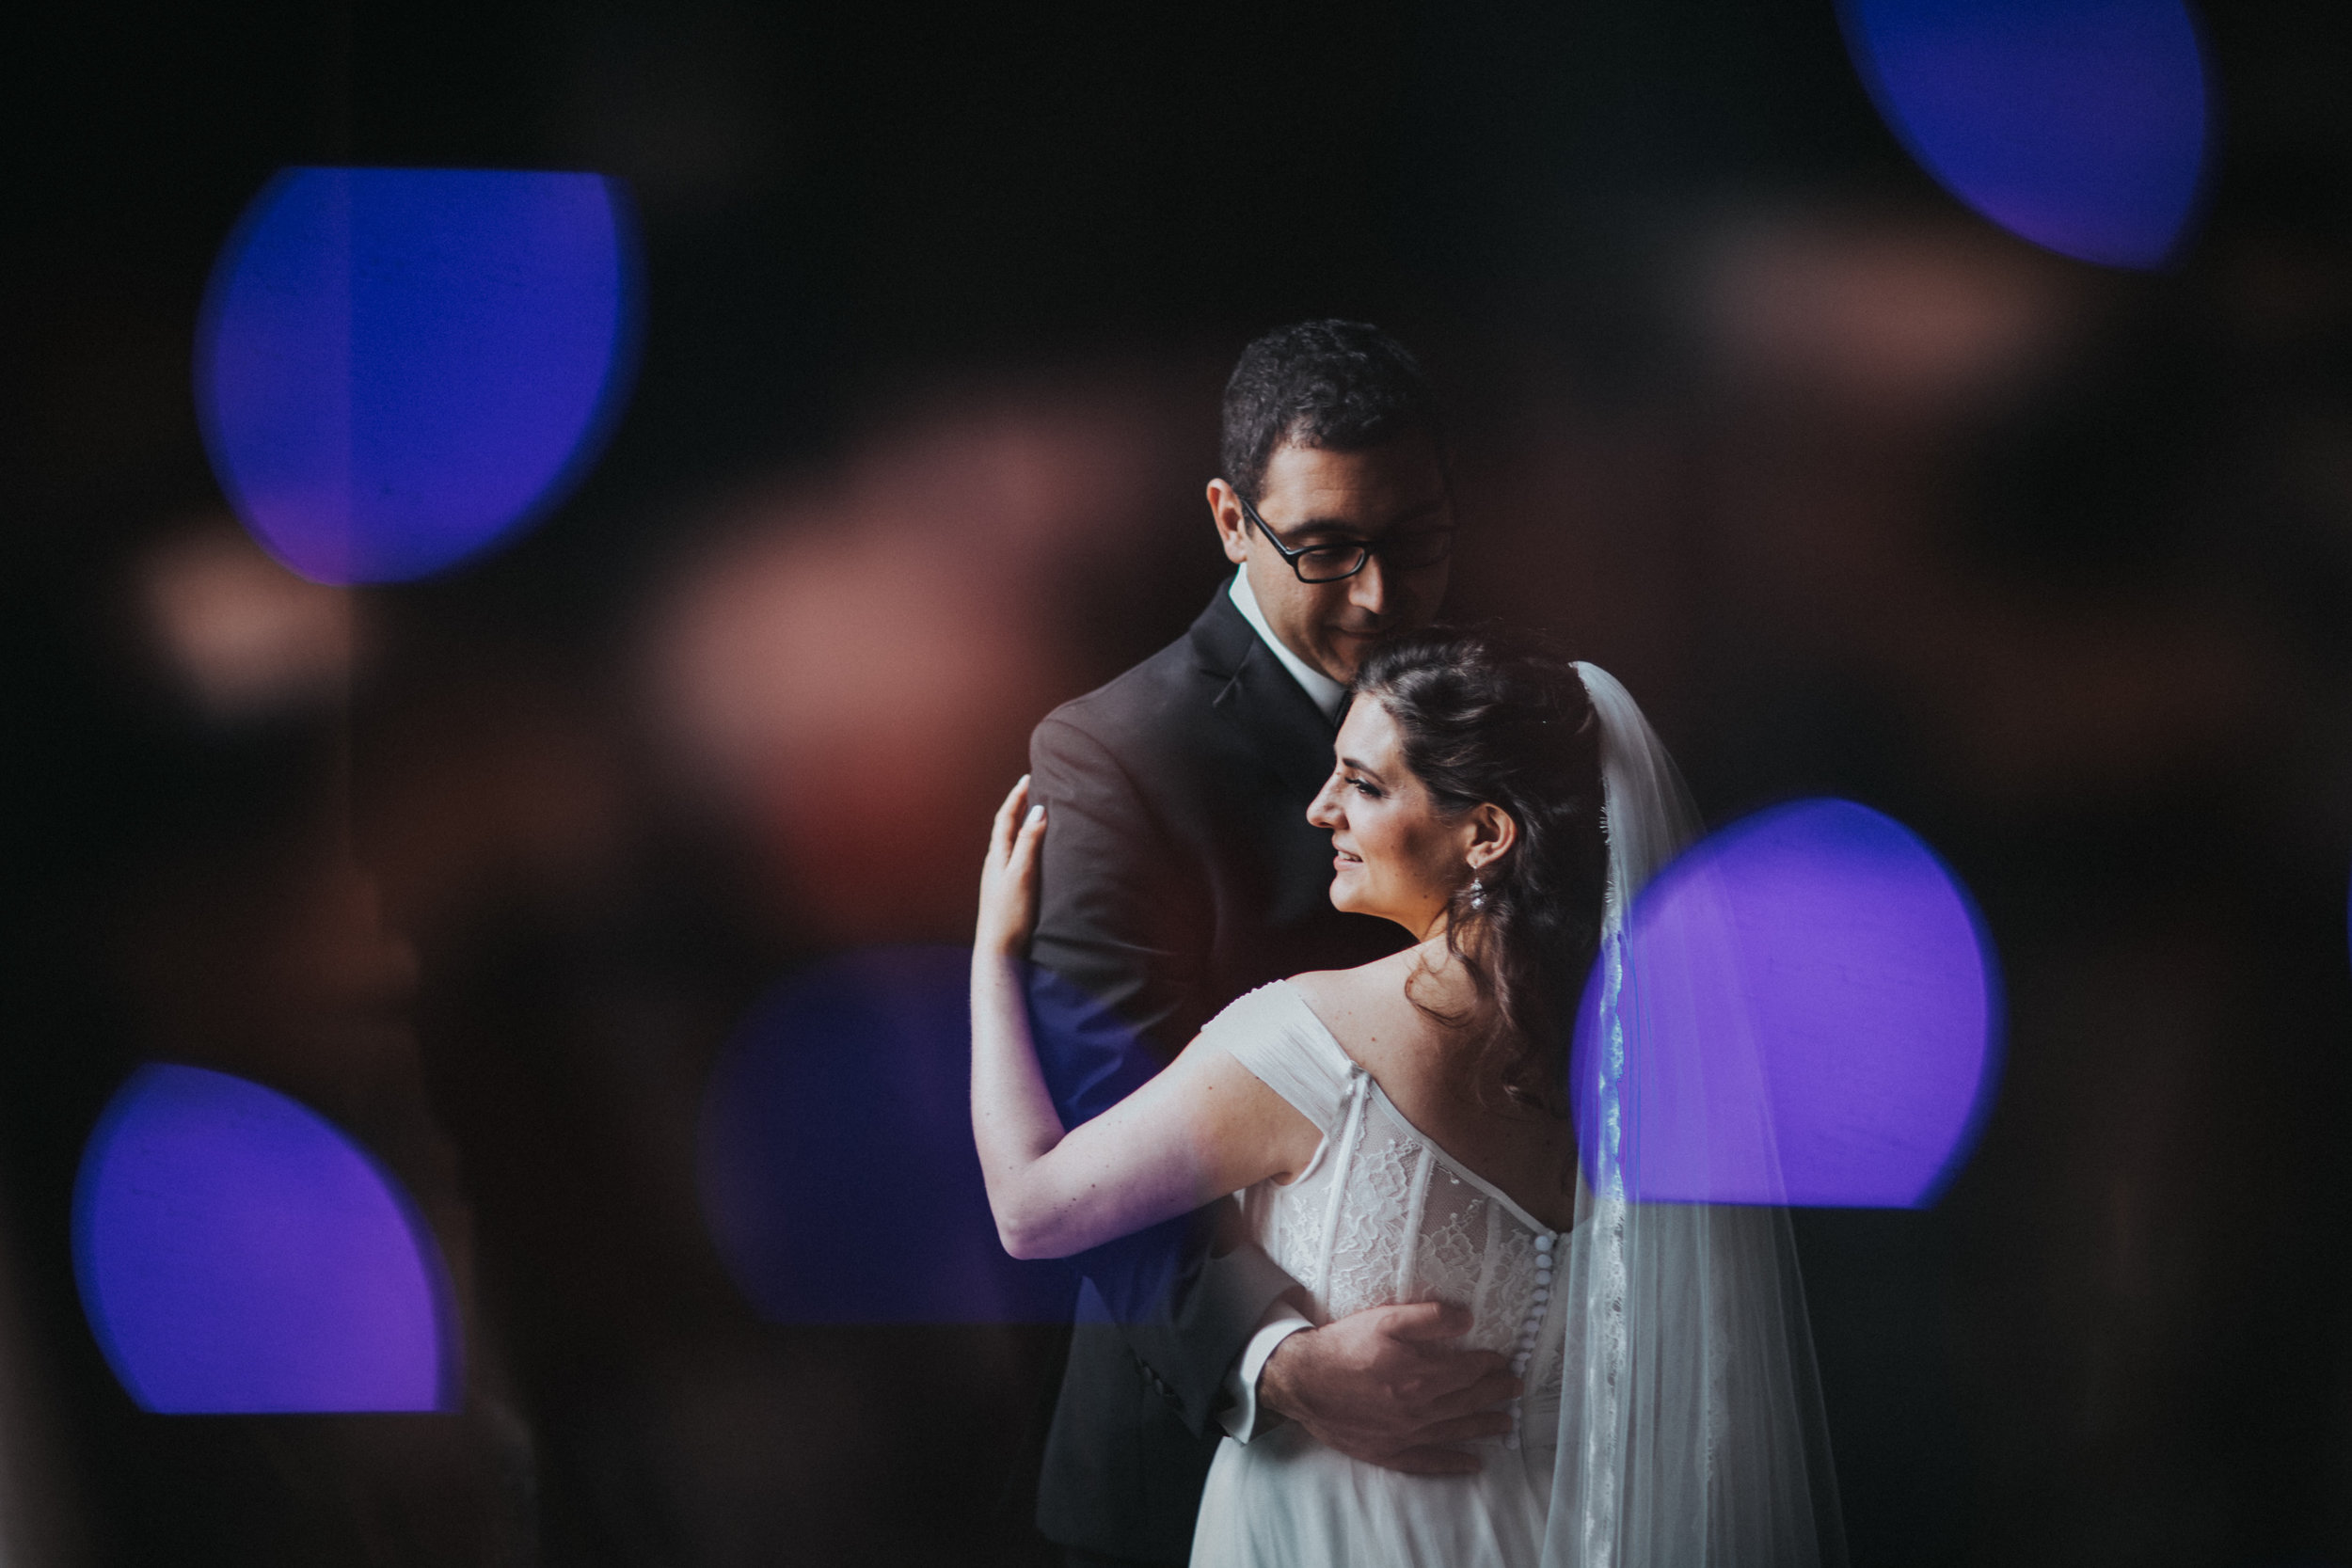 JennaLynnPhotography-NJWeddingPhotographer-Philadelphia-Wedding-ArtsBallroom-BridalParty-83.jpg